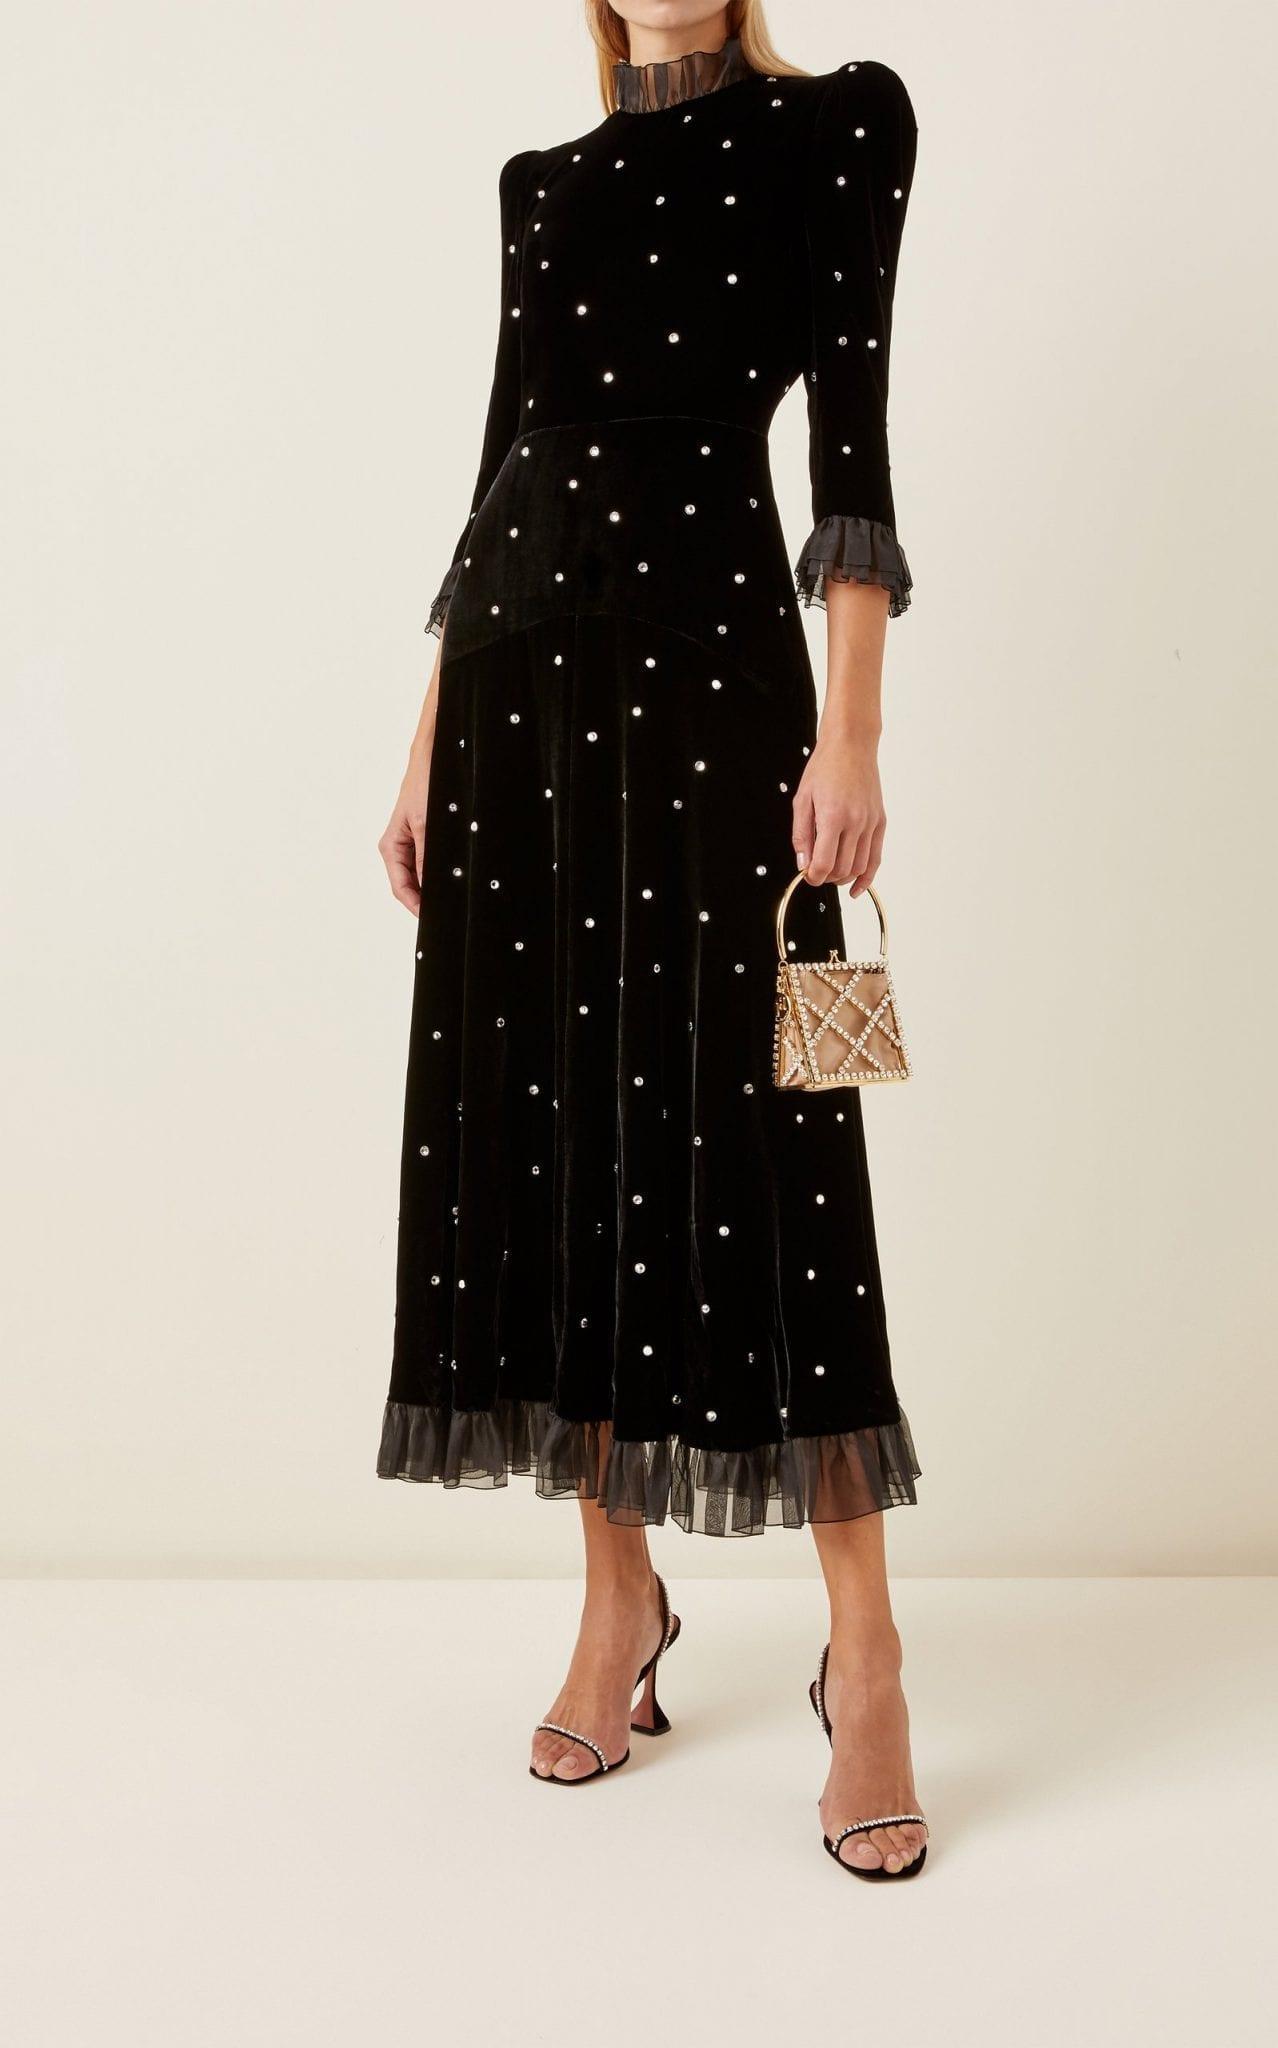 PHILOSOPHY DI LORENZO SERAFINI Organza-Trimmed Crystal-Embellished Velvet Midi Dress